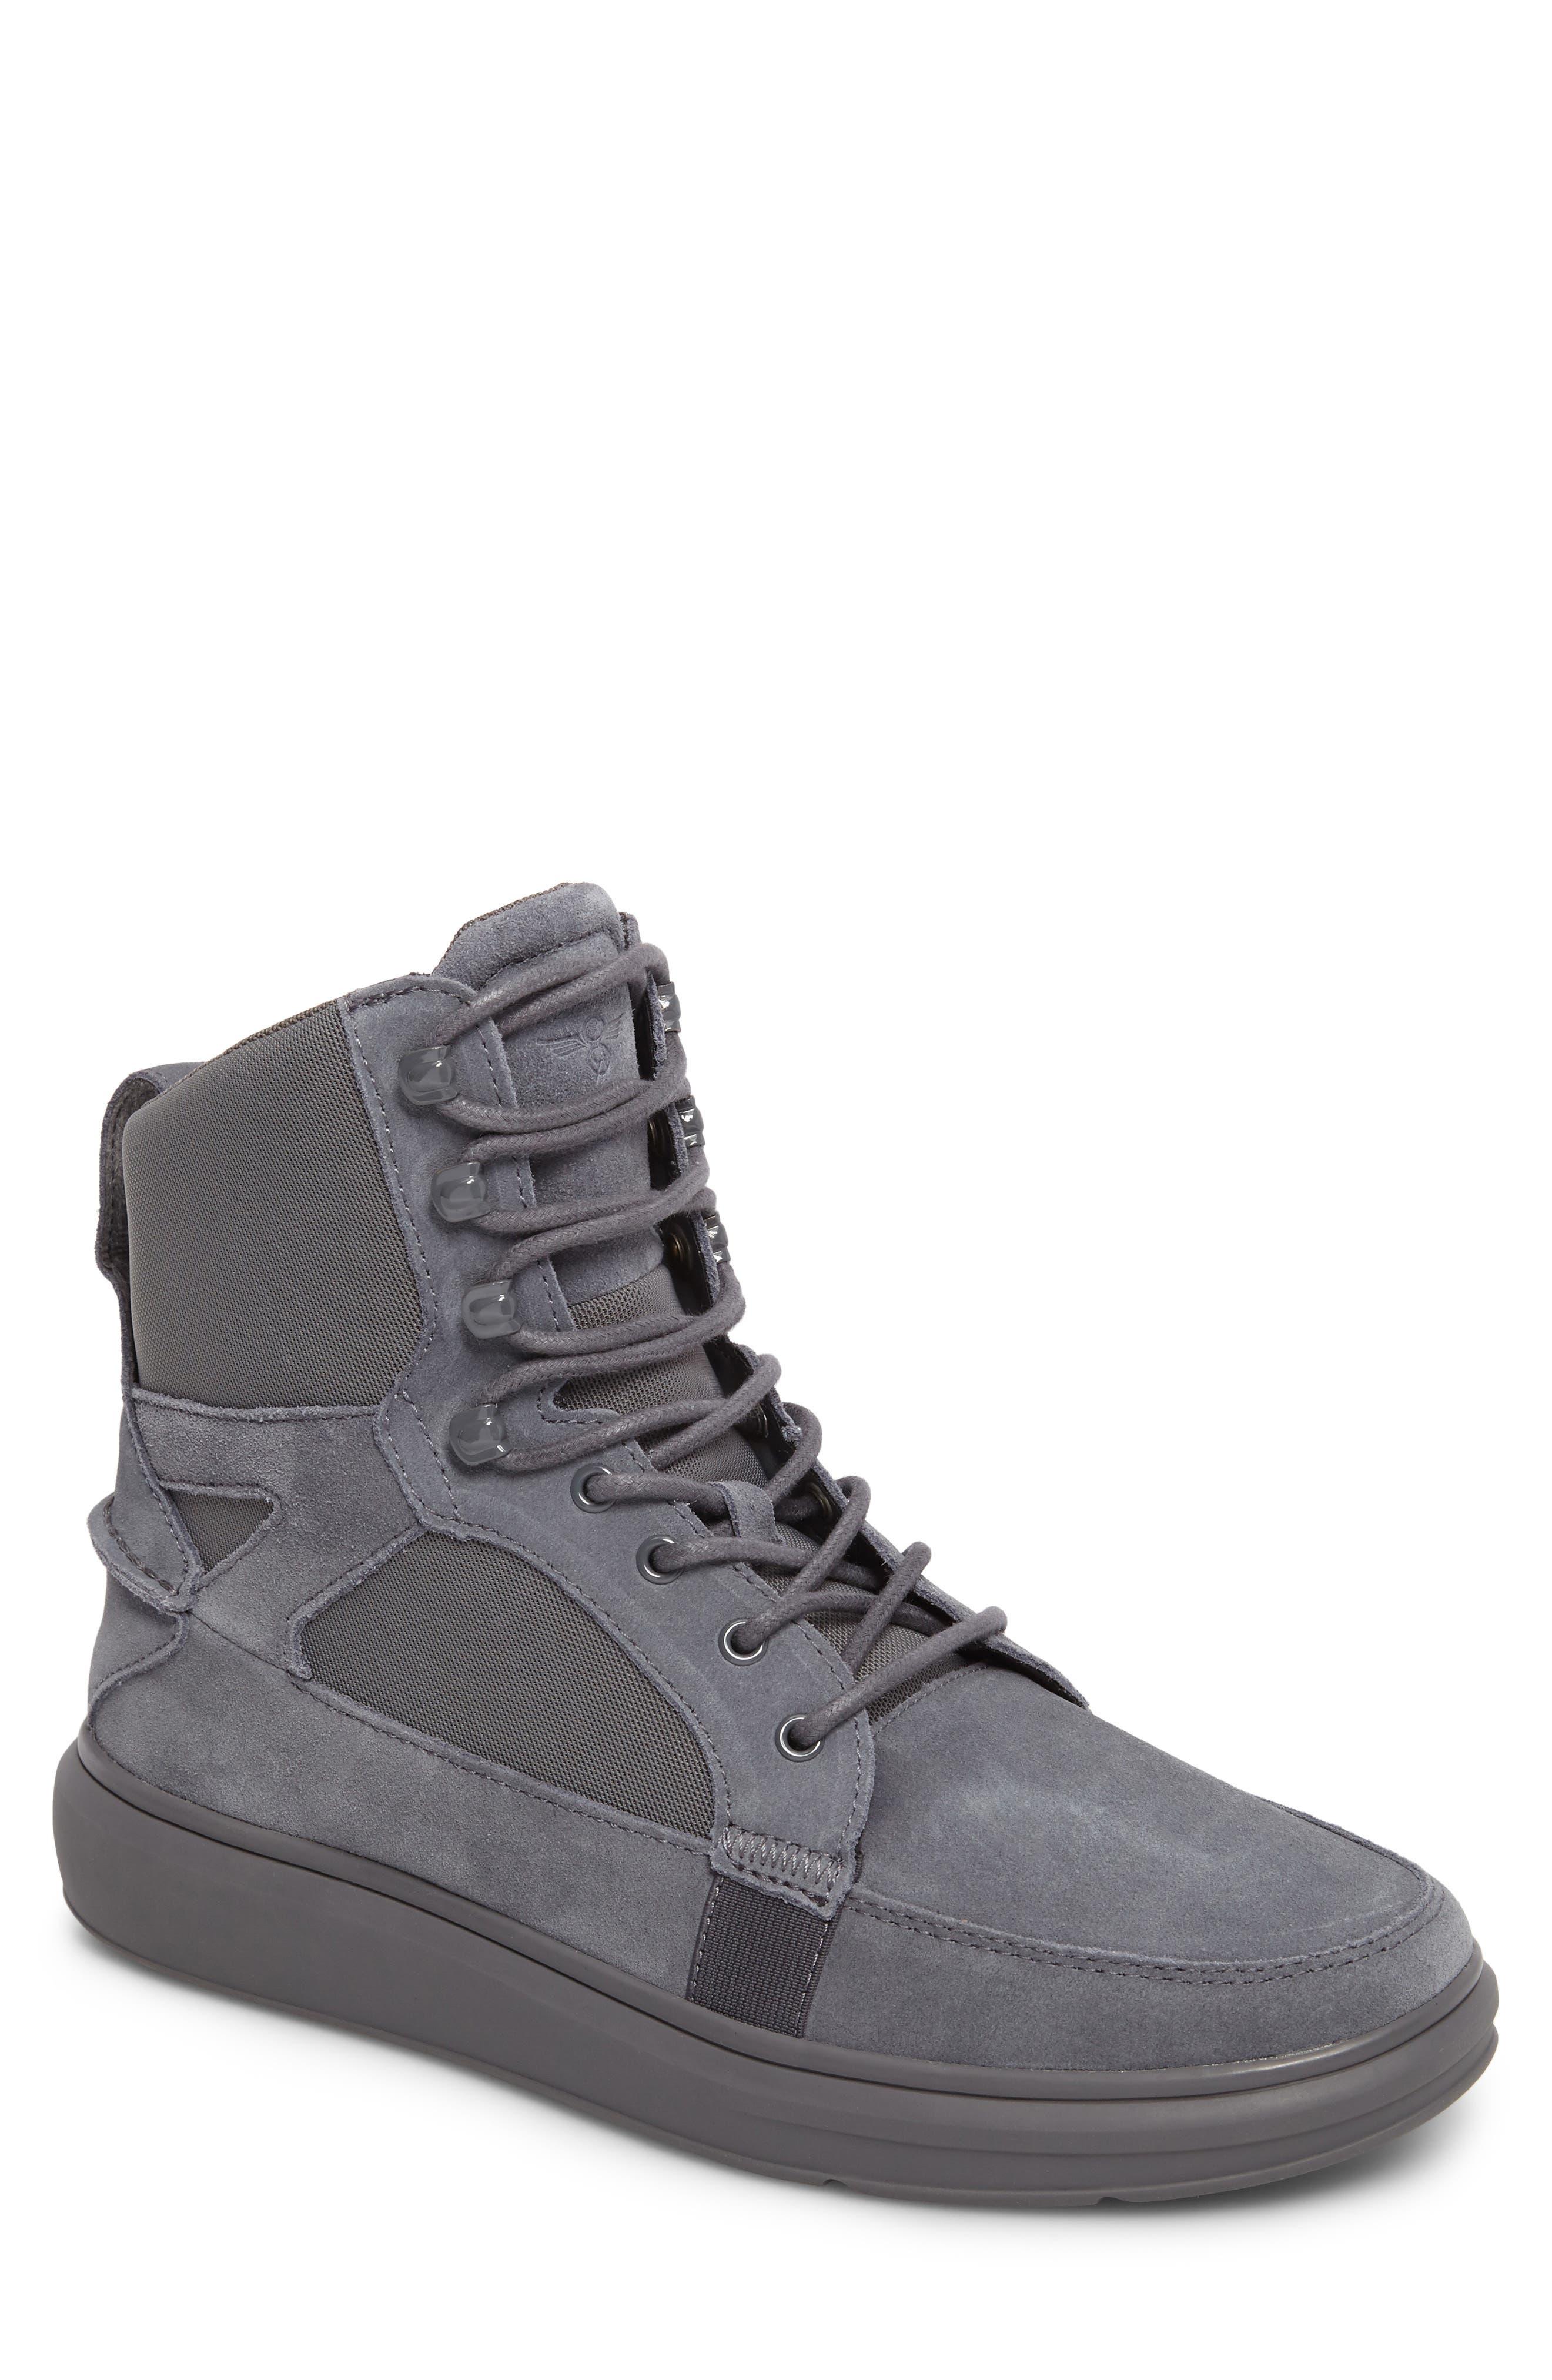 Desimo Sneaker,                         Main,                         color, Smoke Leather